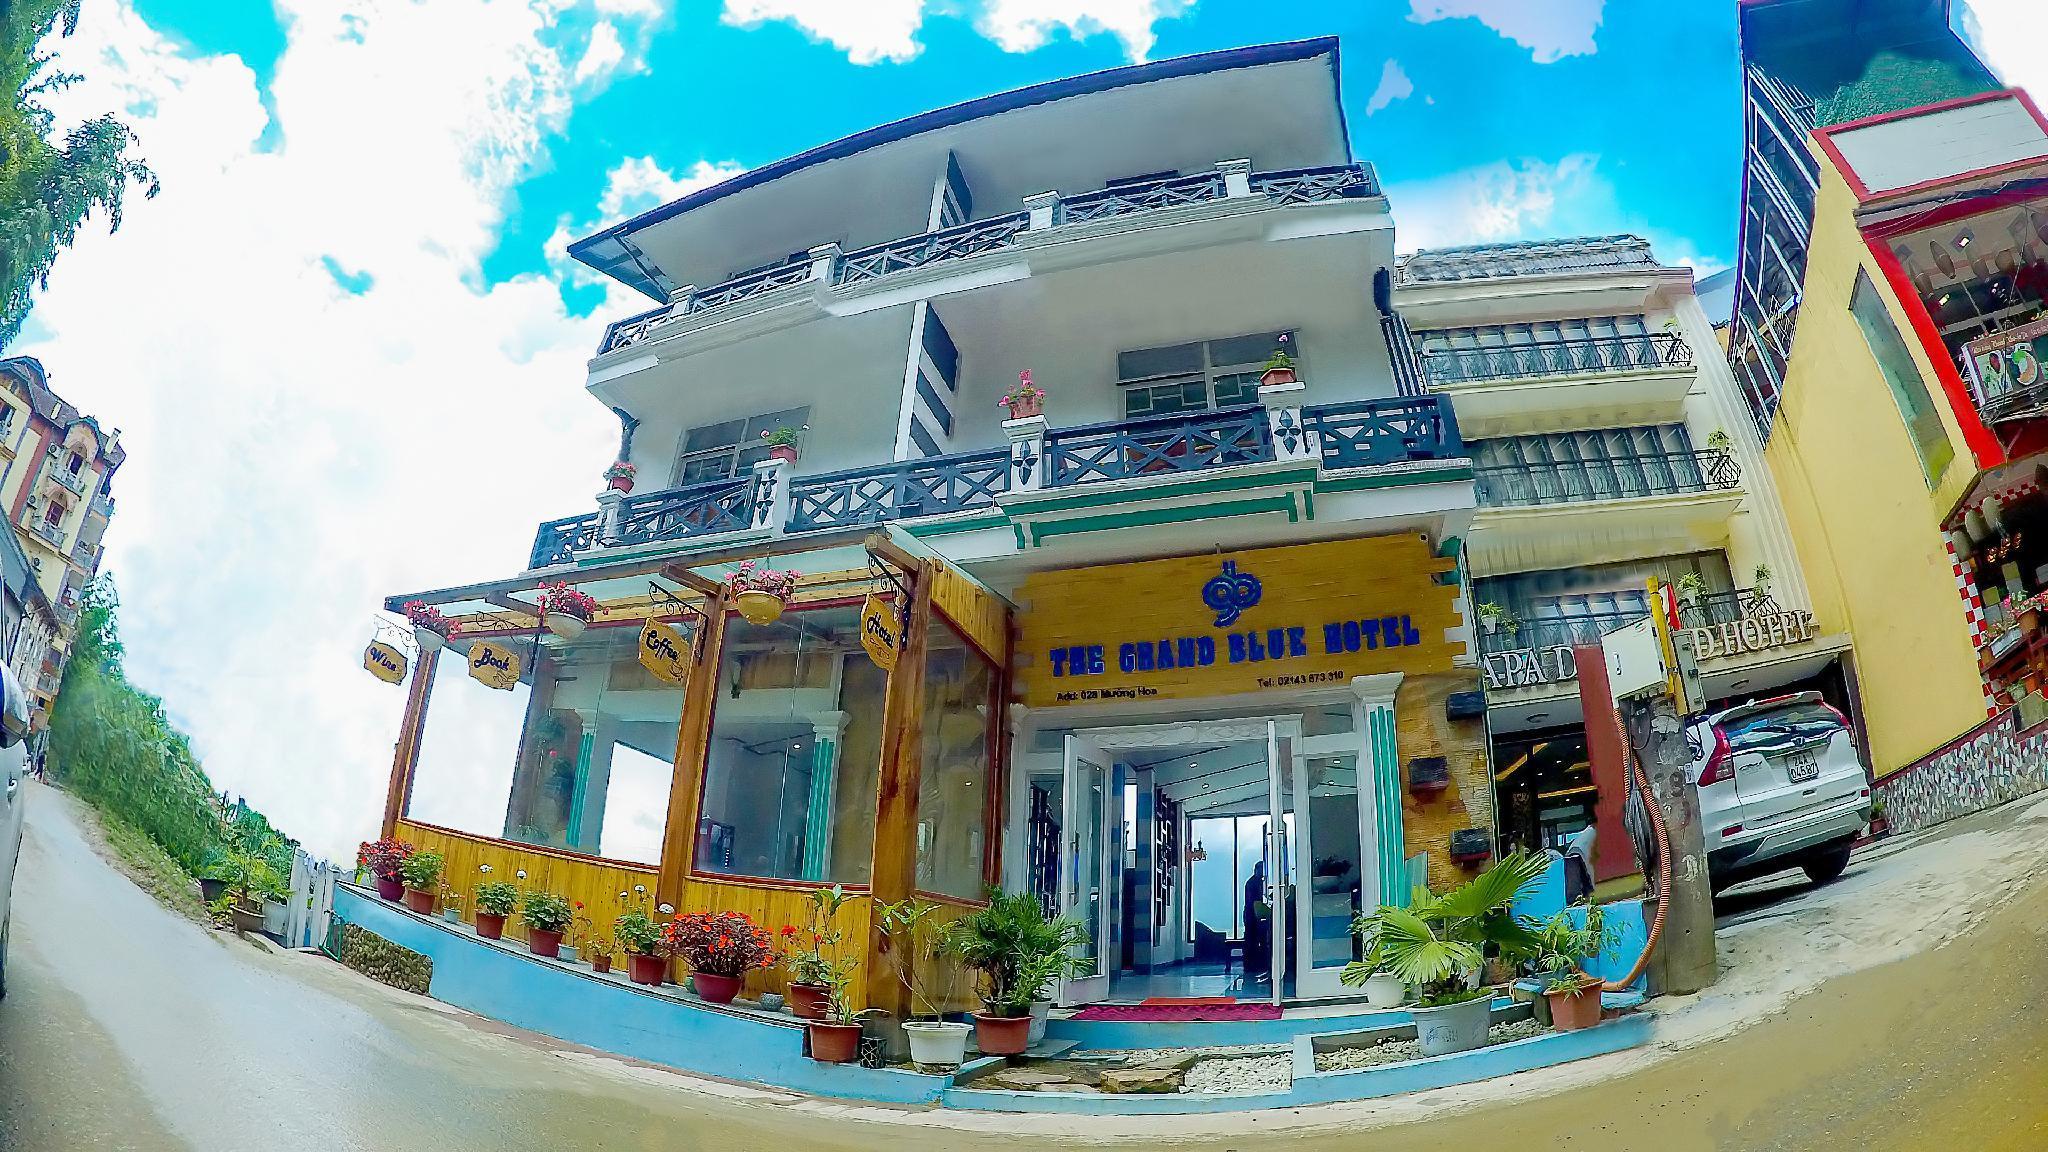 The Grand Blue Hotel